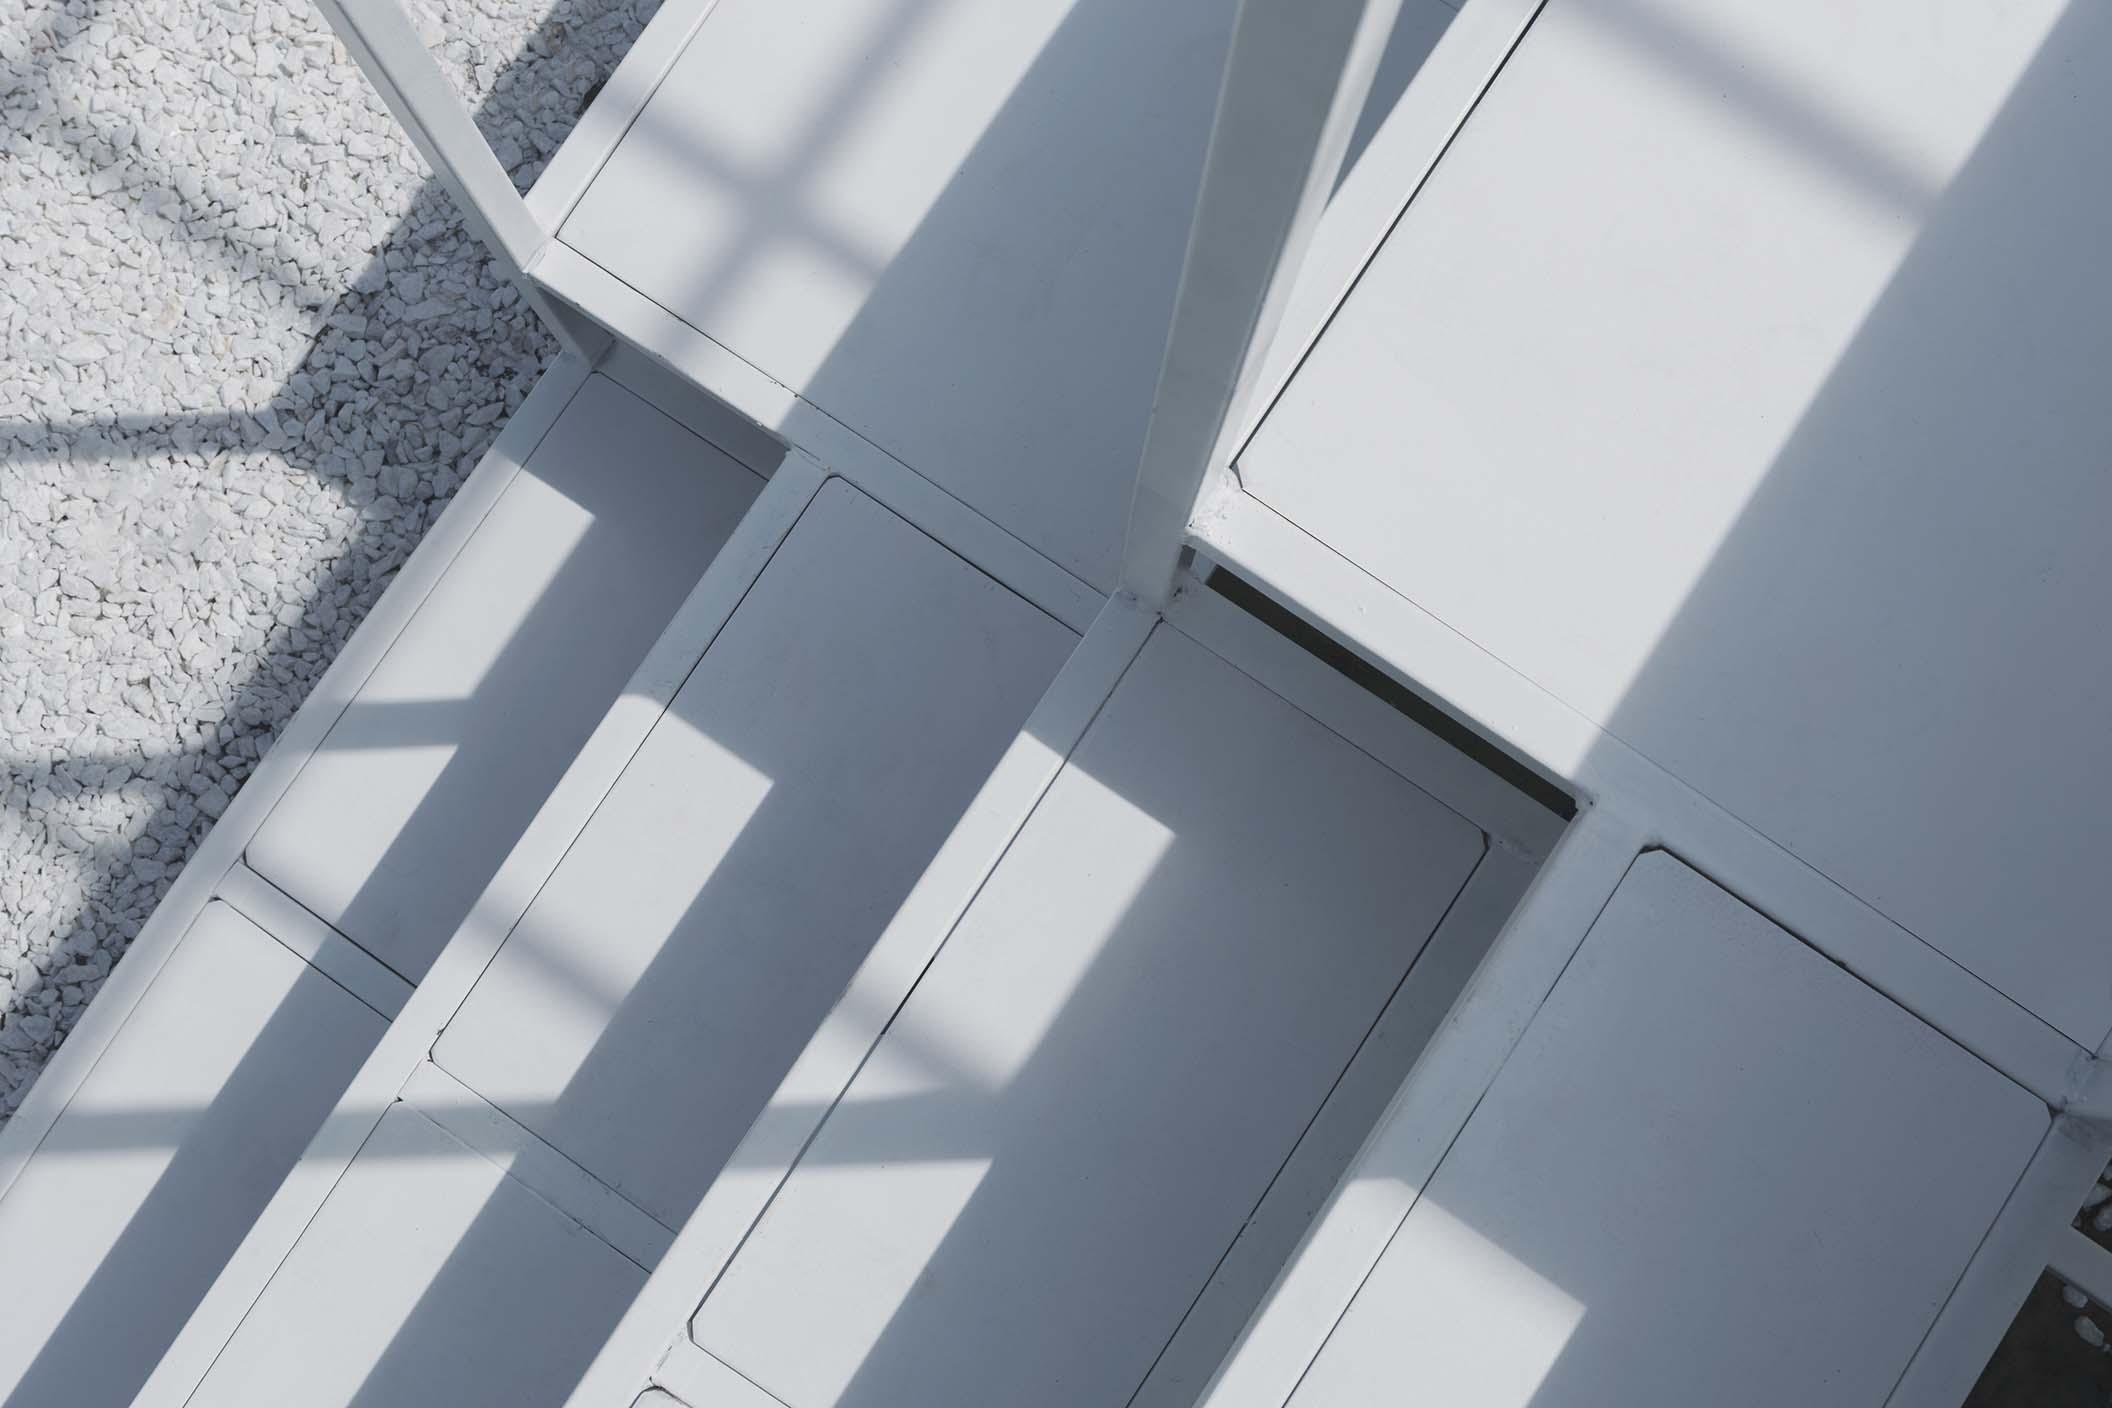 Mist-installation-clap-studio-minsk-24